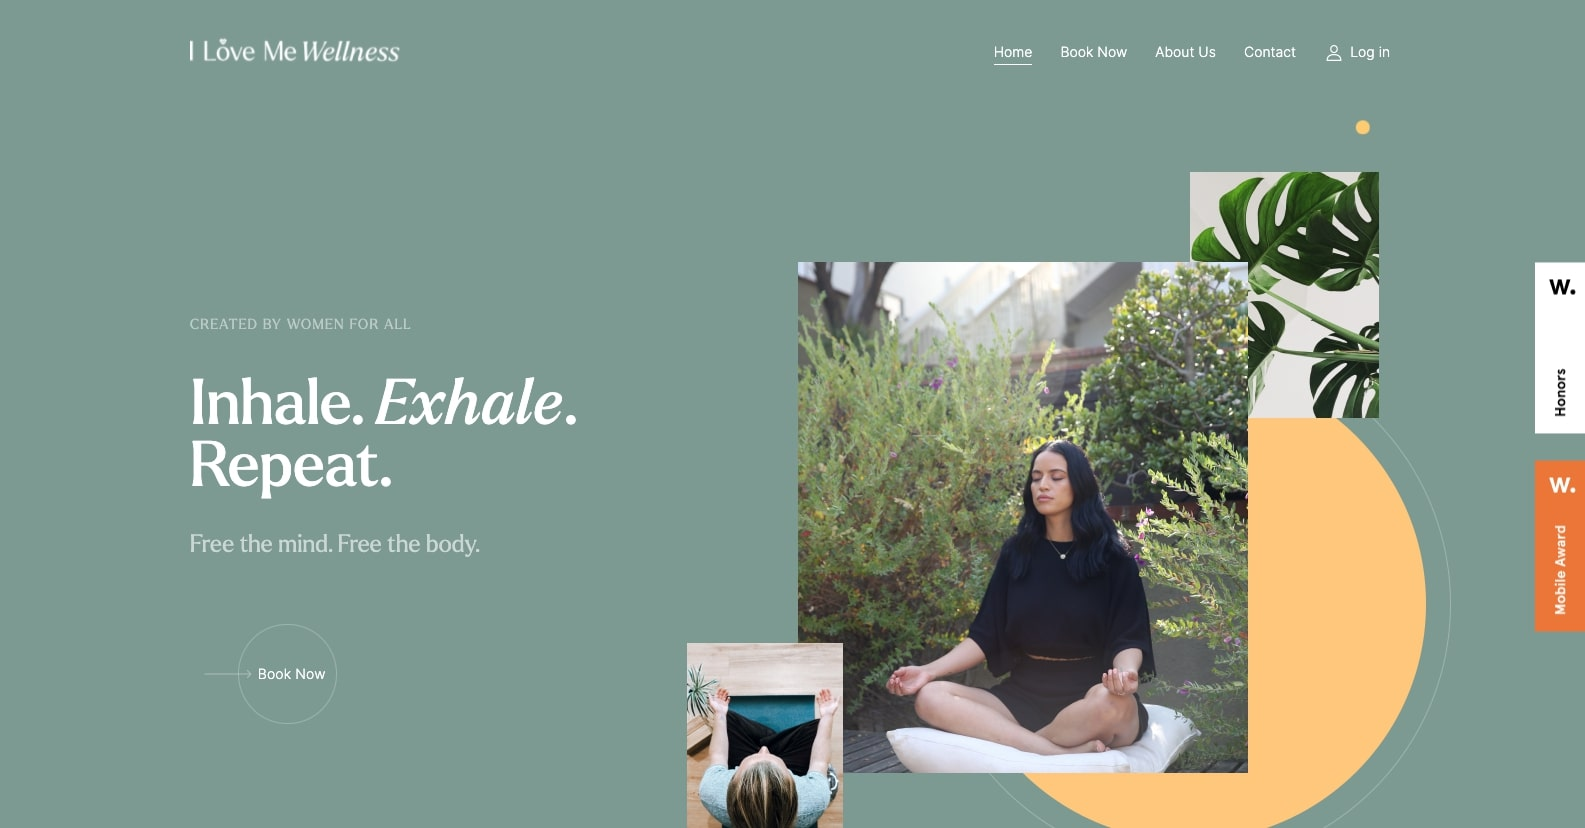 An image of the I Love Me Wellness website.